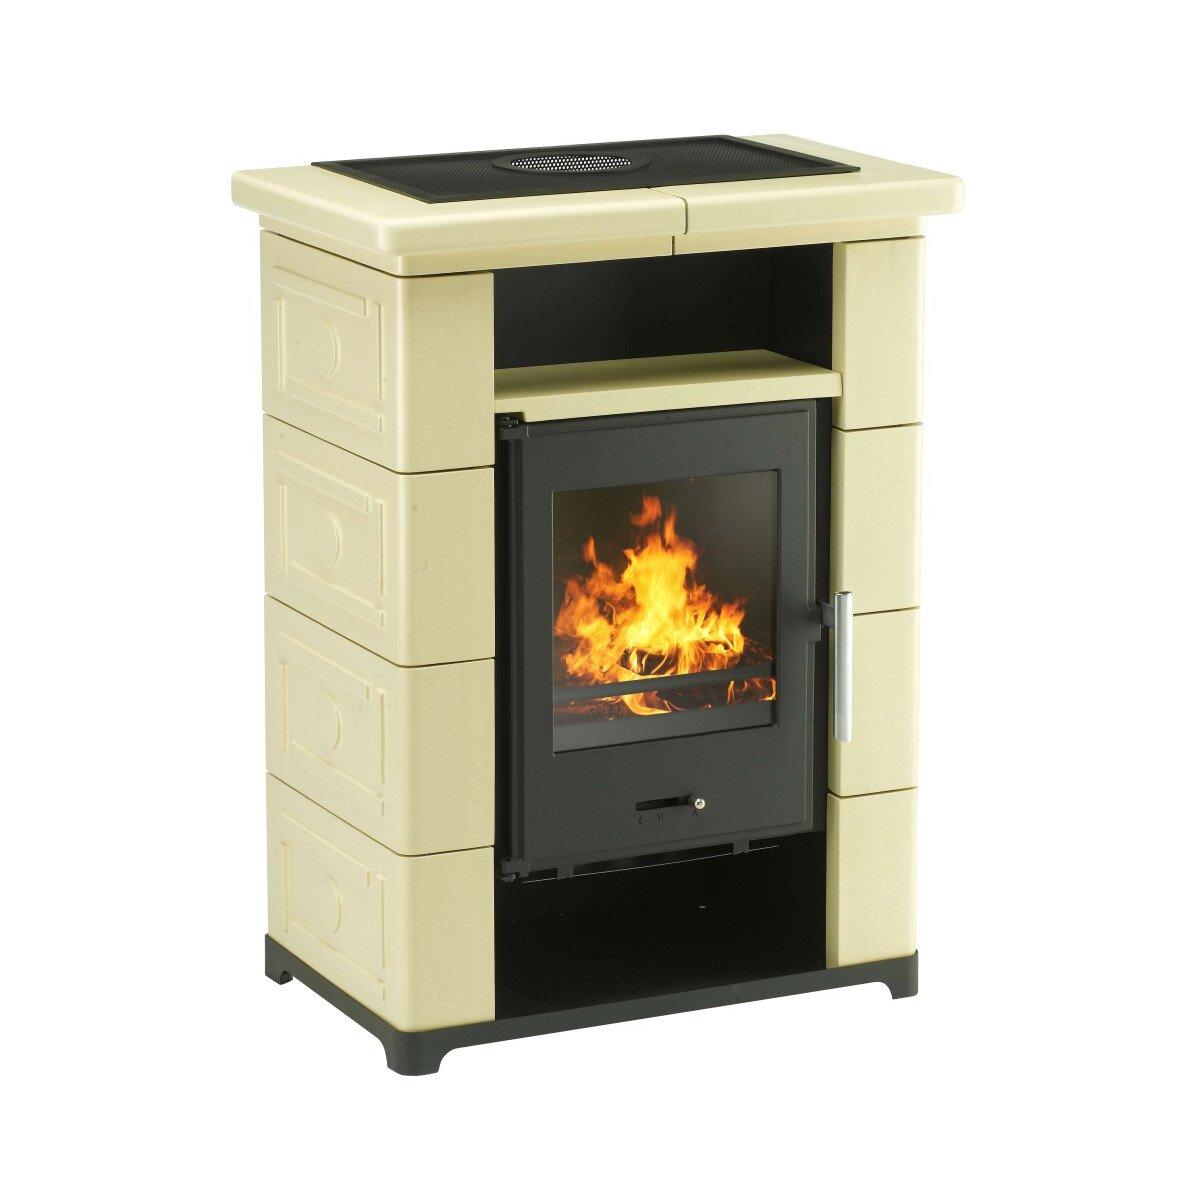 kaminofen wamsler montafon schwarz mit keramik beige 7kw. Black Bedroom Furniture Sets. Home Design Ideas